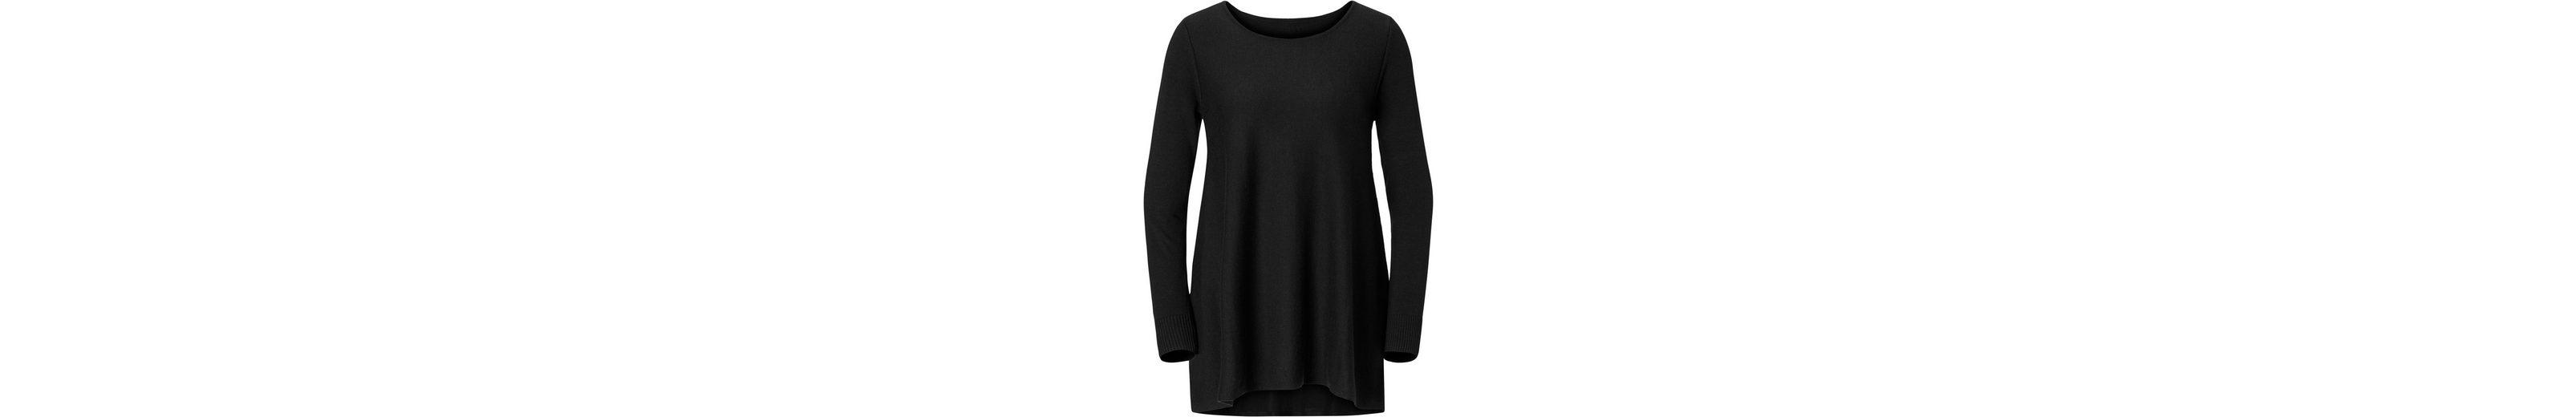 Hyper Online Création L Pullover im Zipfellook Classic Zum Verkauf Ausverkaufs-Shop 1ZhRG